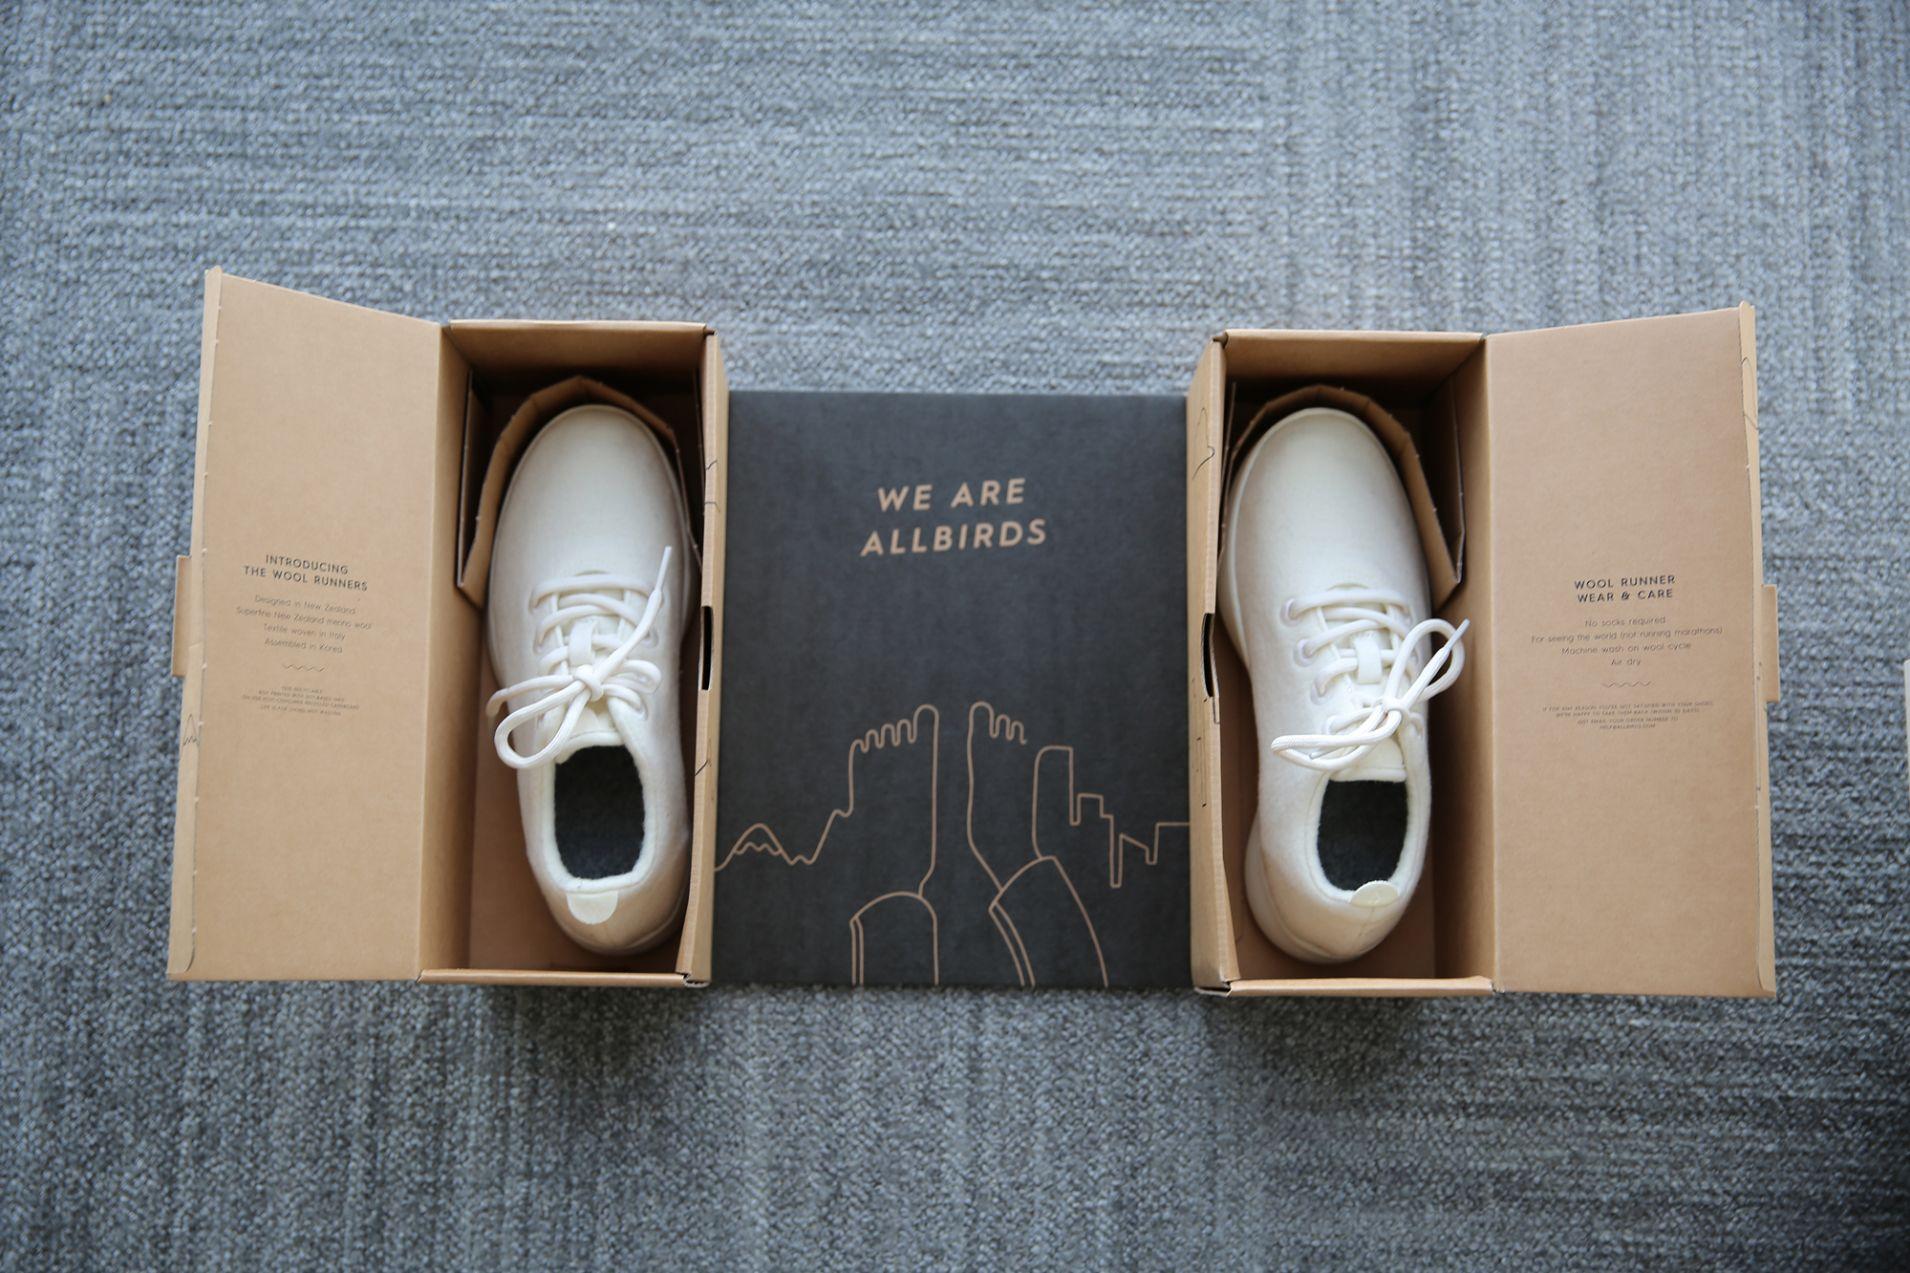 Allbirds正在申請中的專利包裝是結合鞋盒和運送盒二合一 ,比其他傳統電商鞋的包材少40%。 Photo Credit :  CNBC.com